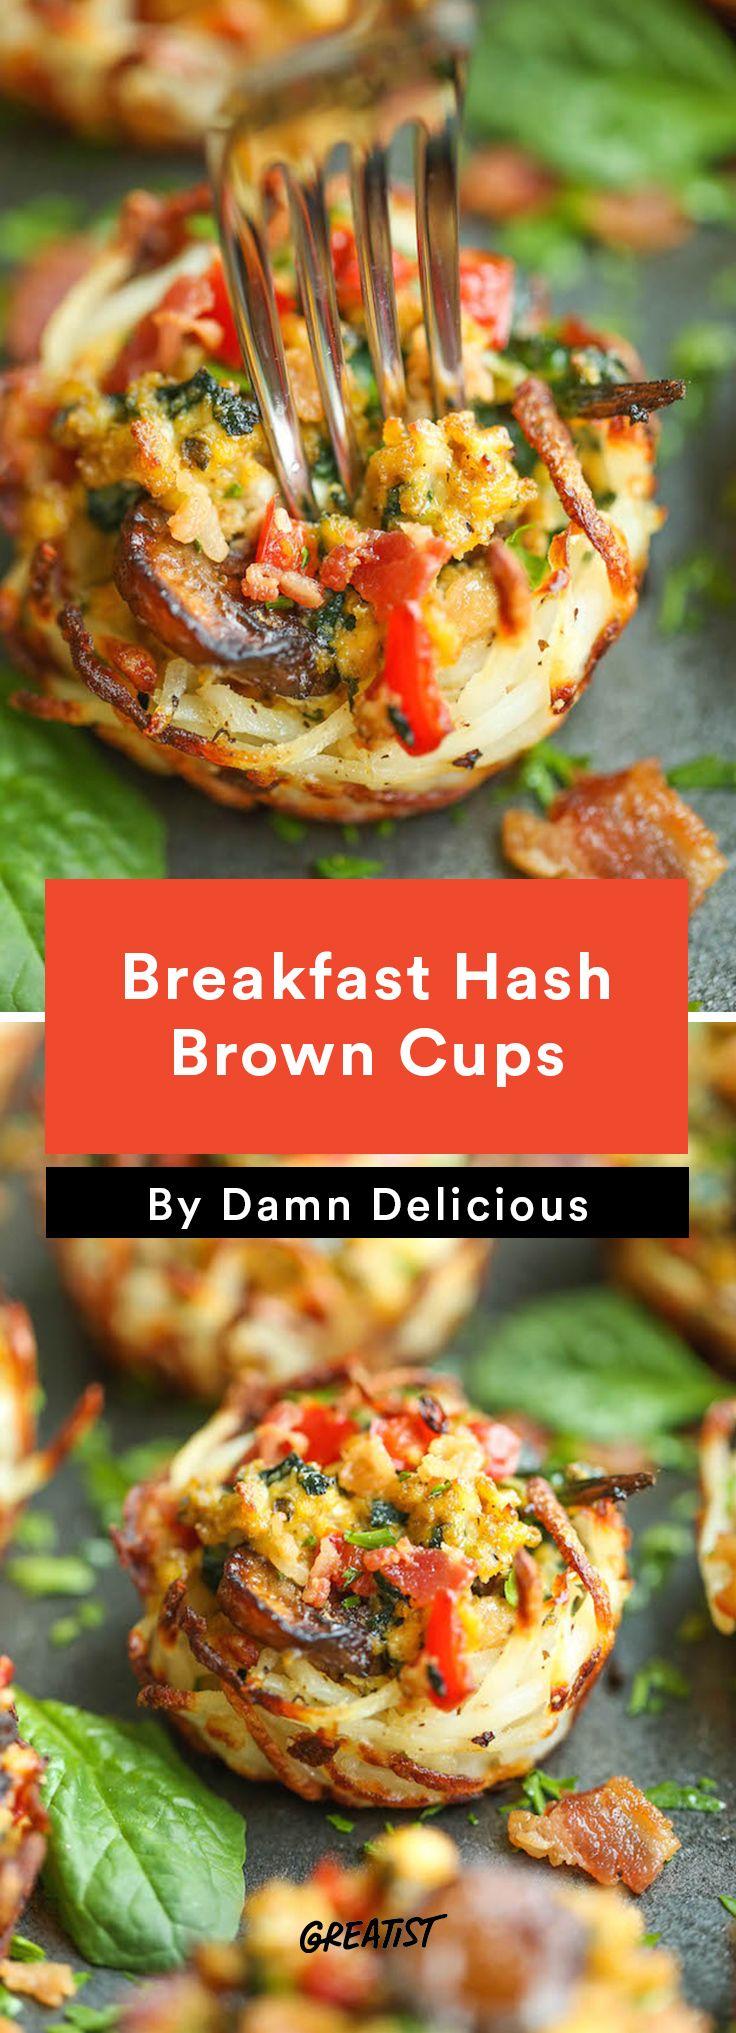 1. Breakfast Hash Brown Cups #healthy #breakfast #recipes…